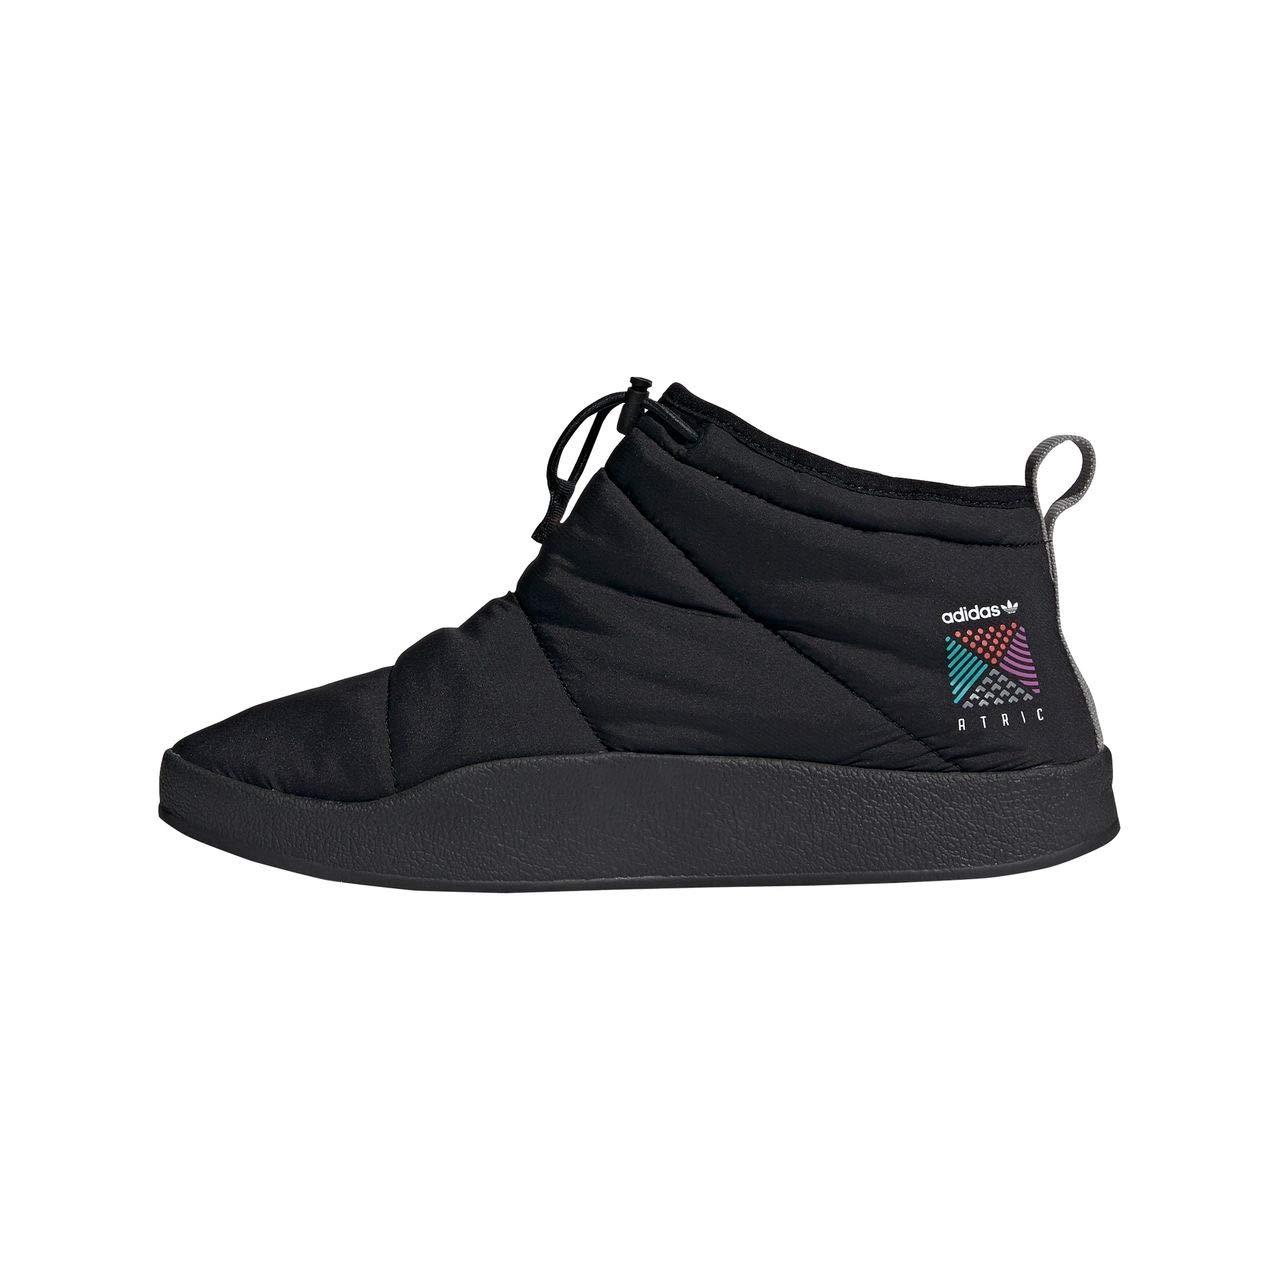 Adidas Adilette Prima - cschwarz eneink lgrani lgrani lgrani 040a43